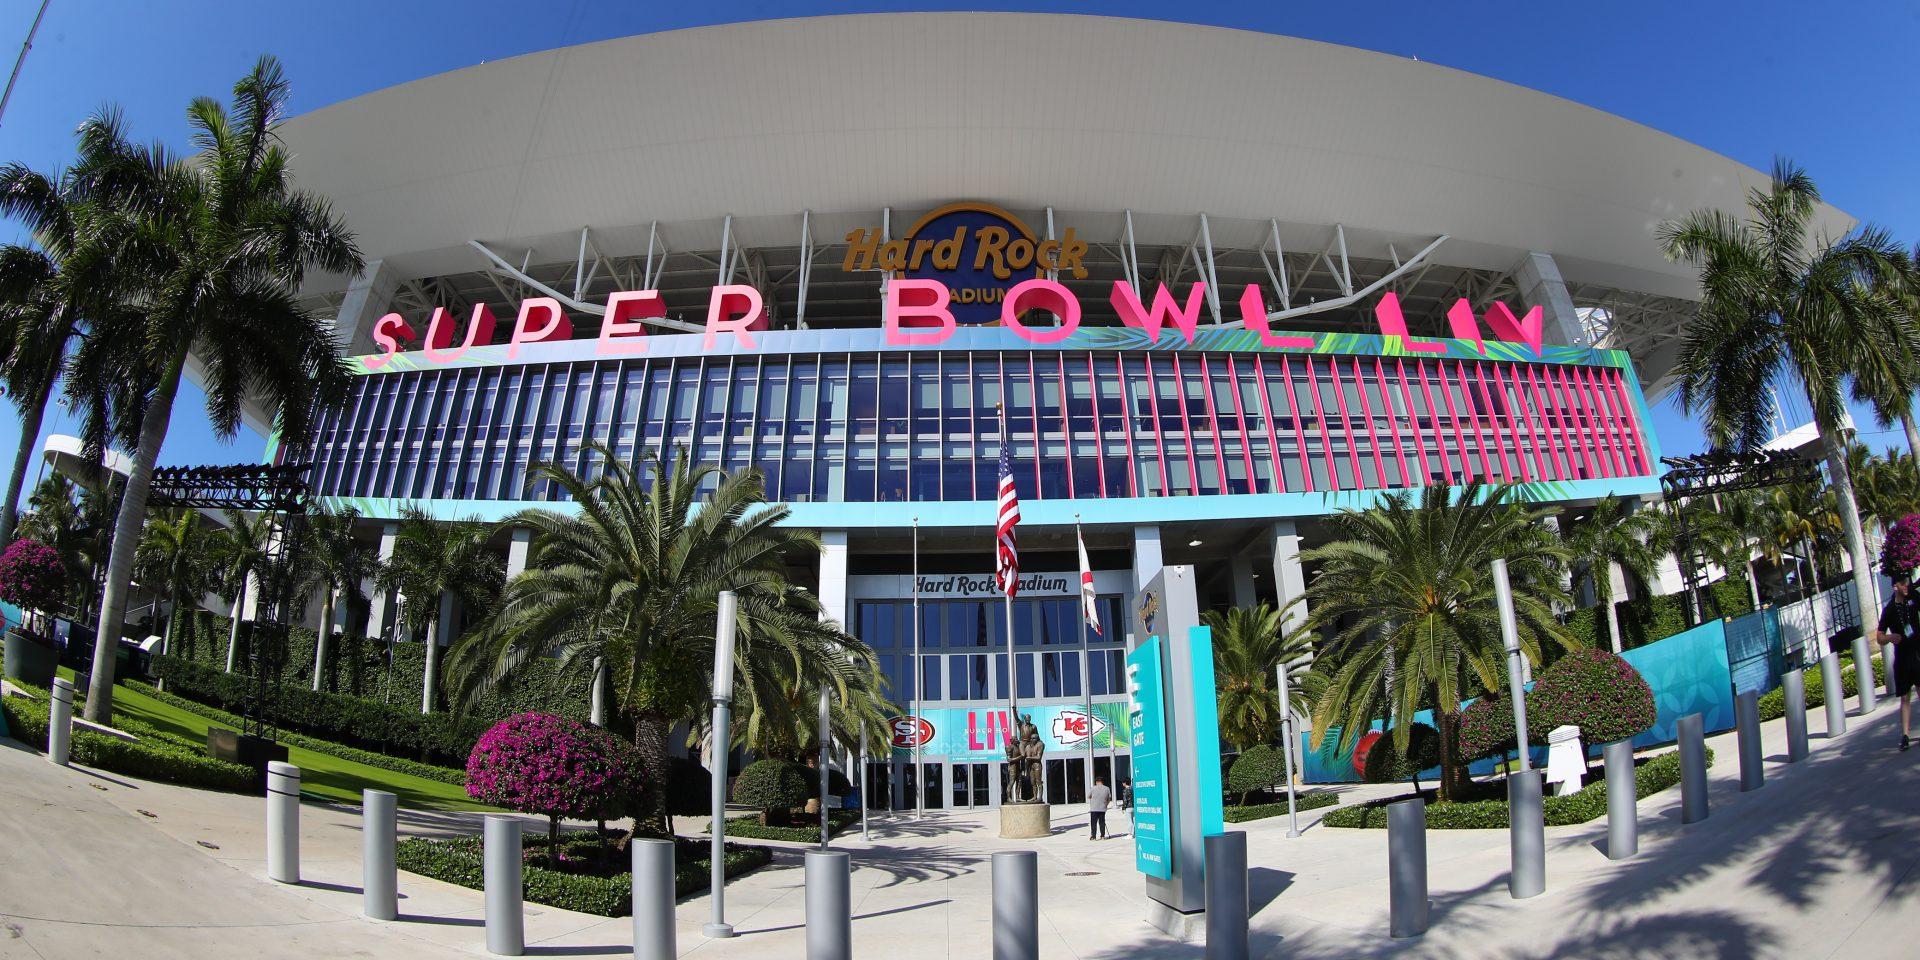 NFL, Populous Get Creative With Super Bowl Logistics